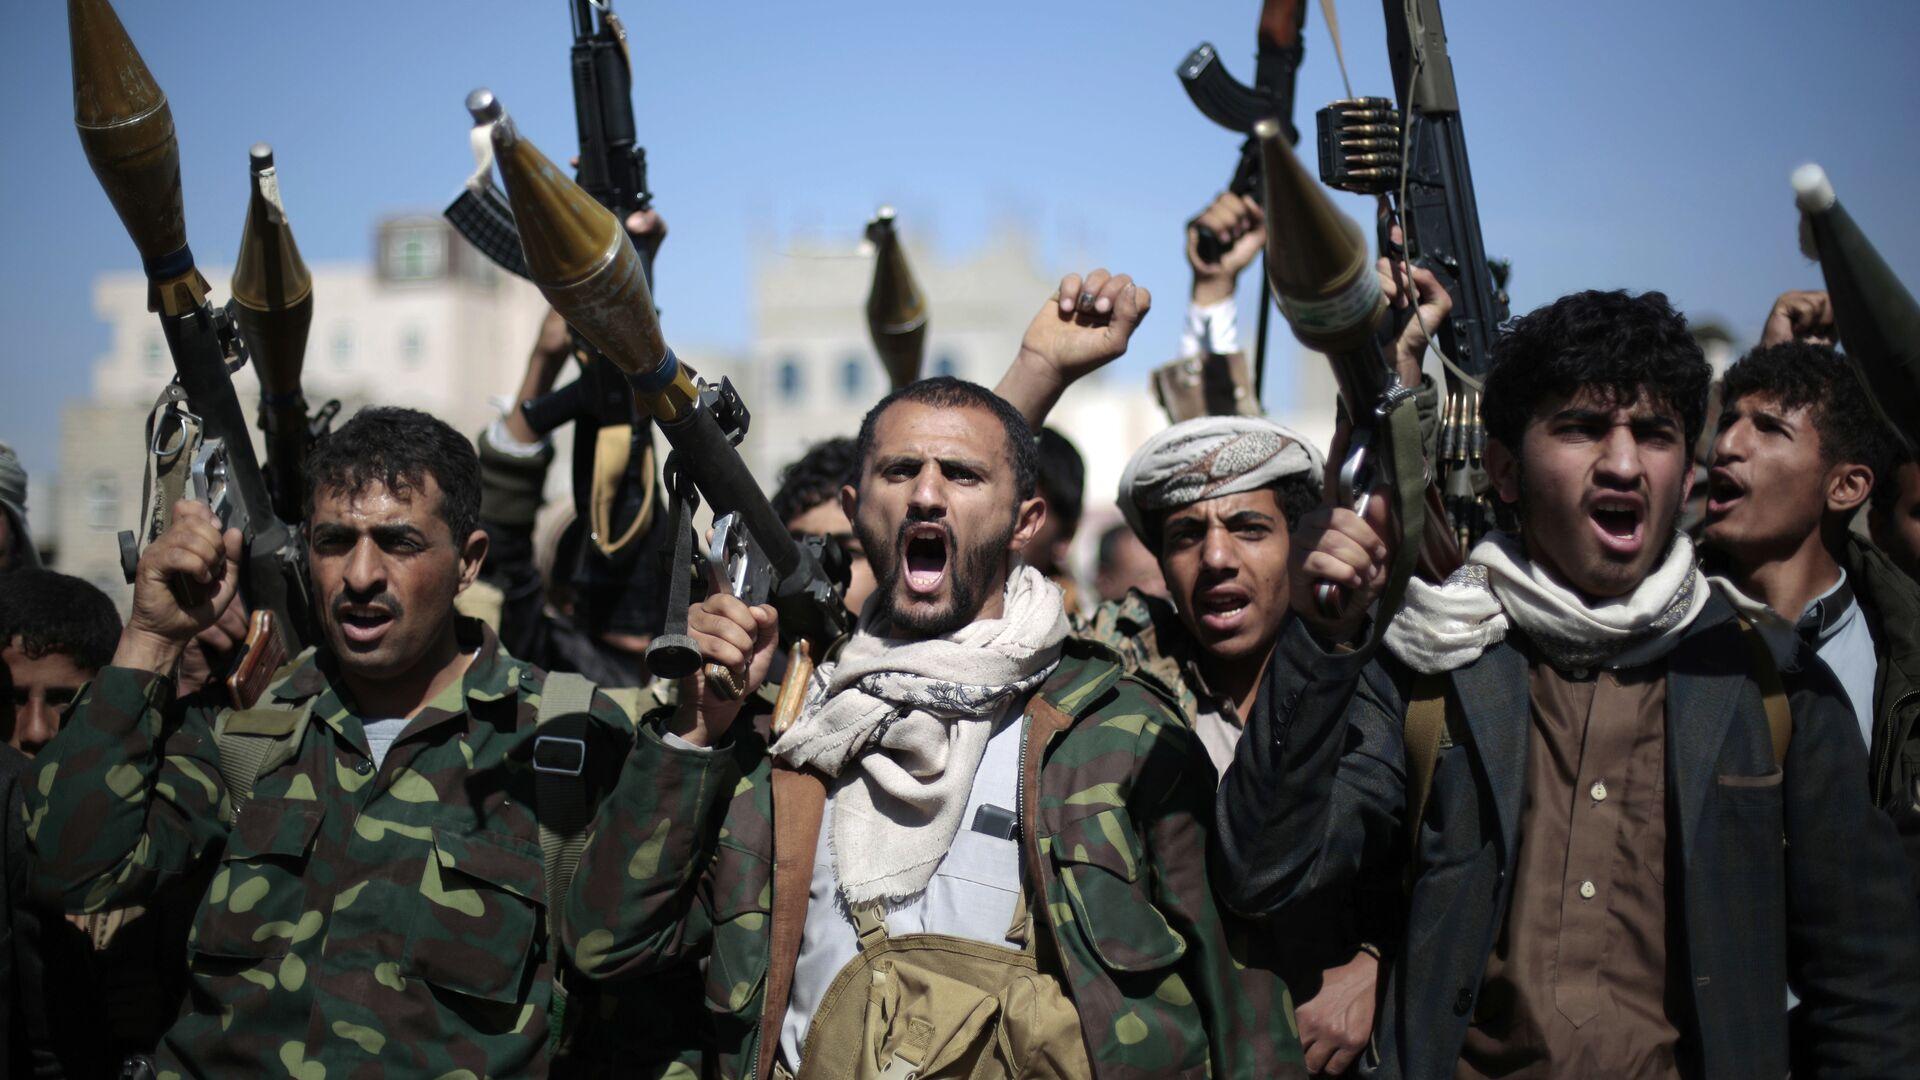 Rebeldes hutíes en Yemen (archivo) - Sputnik Mundo, 1920, 08.04.2021